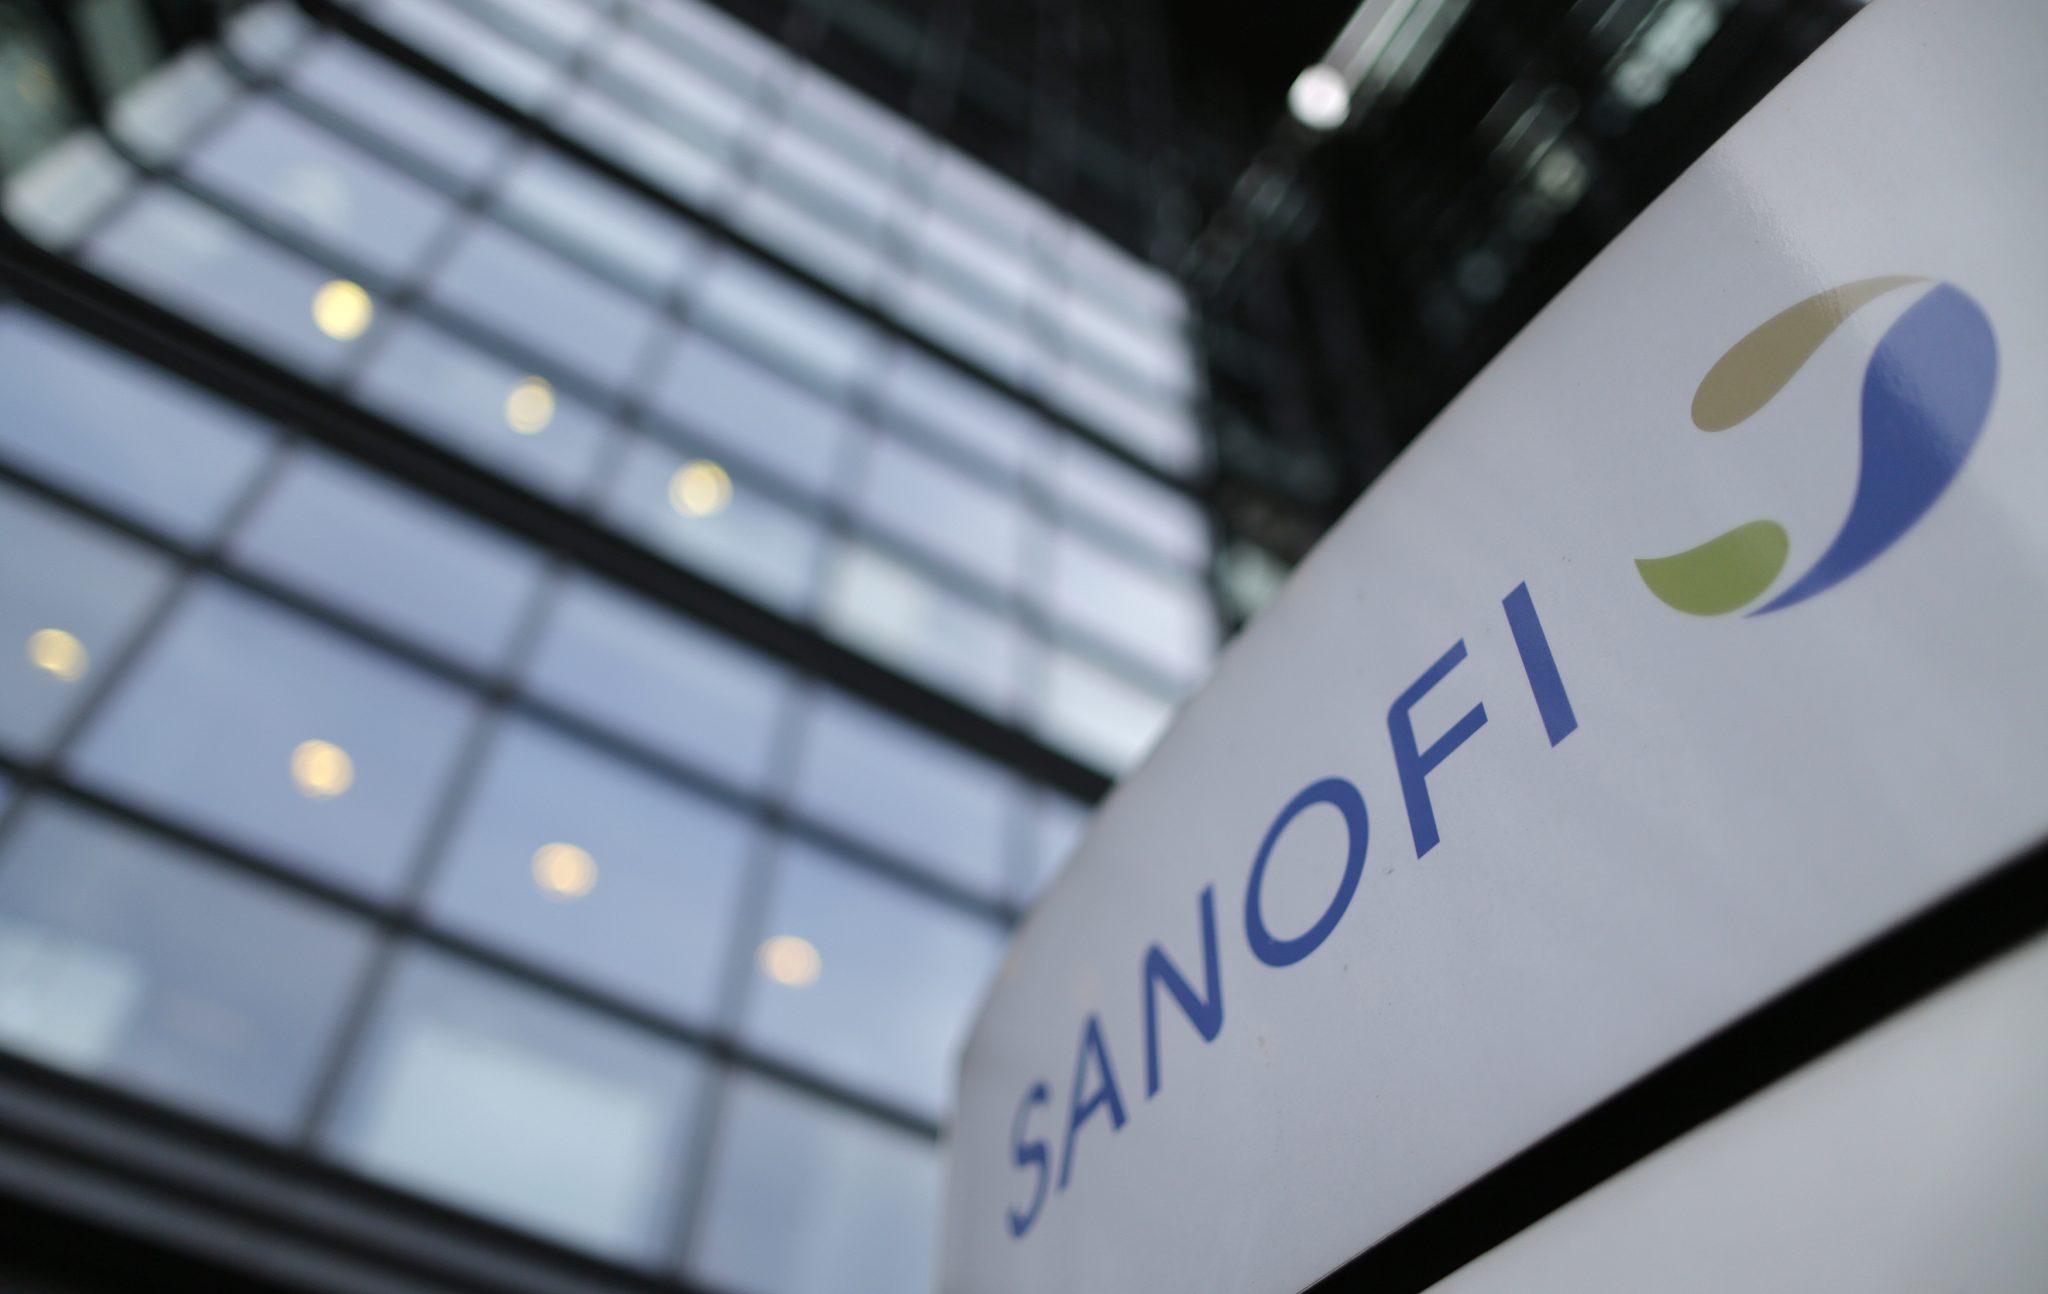 Sanofi SA (SAN) Receives Average Rating of